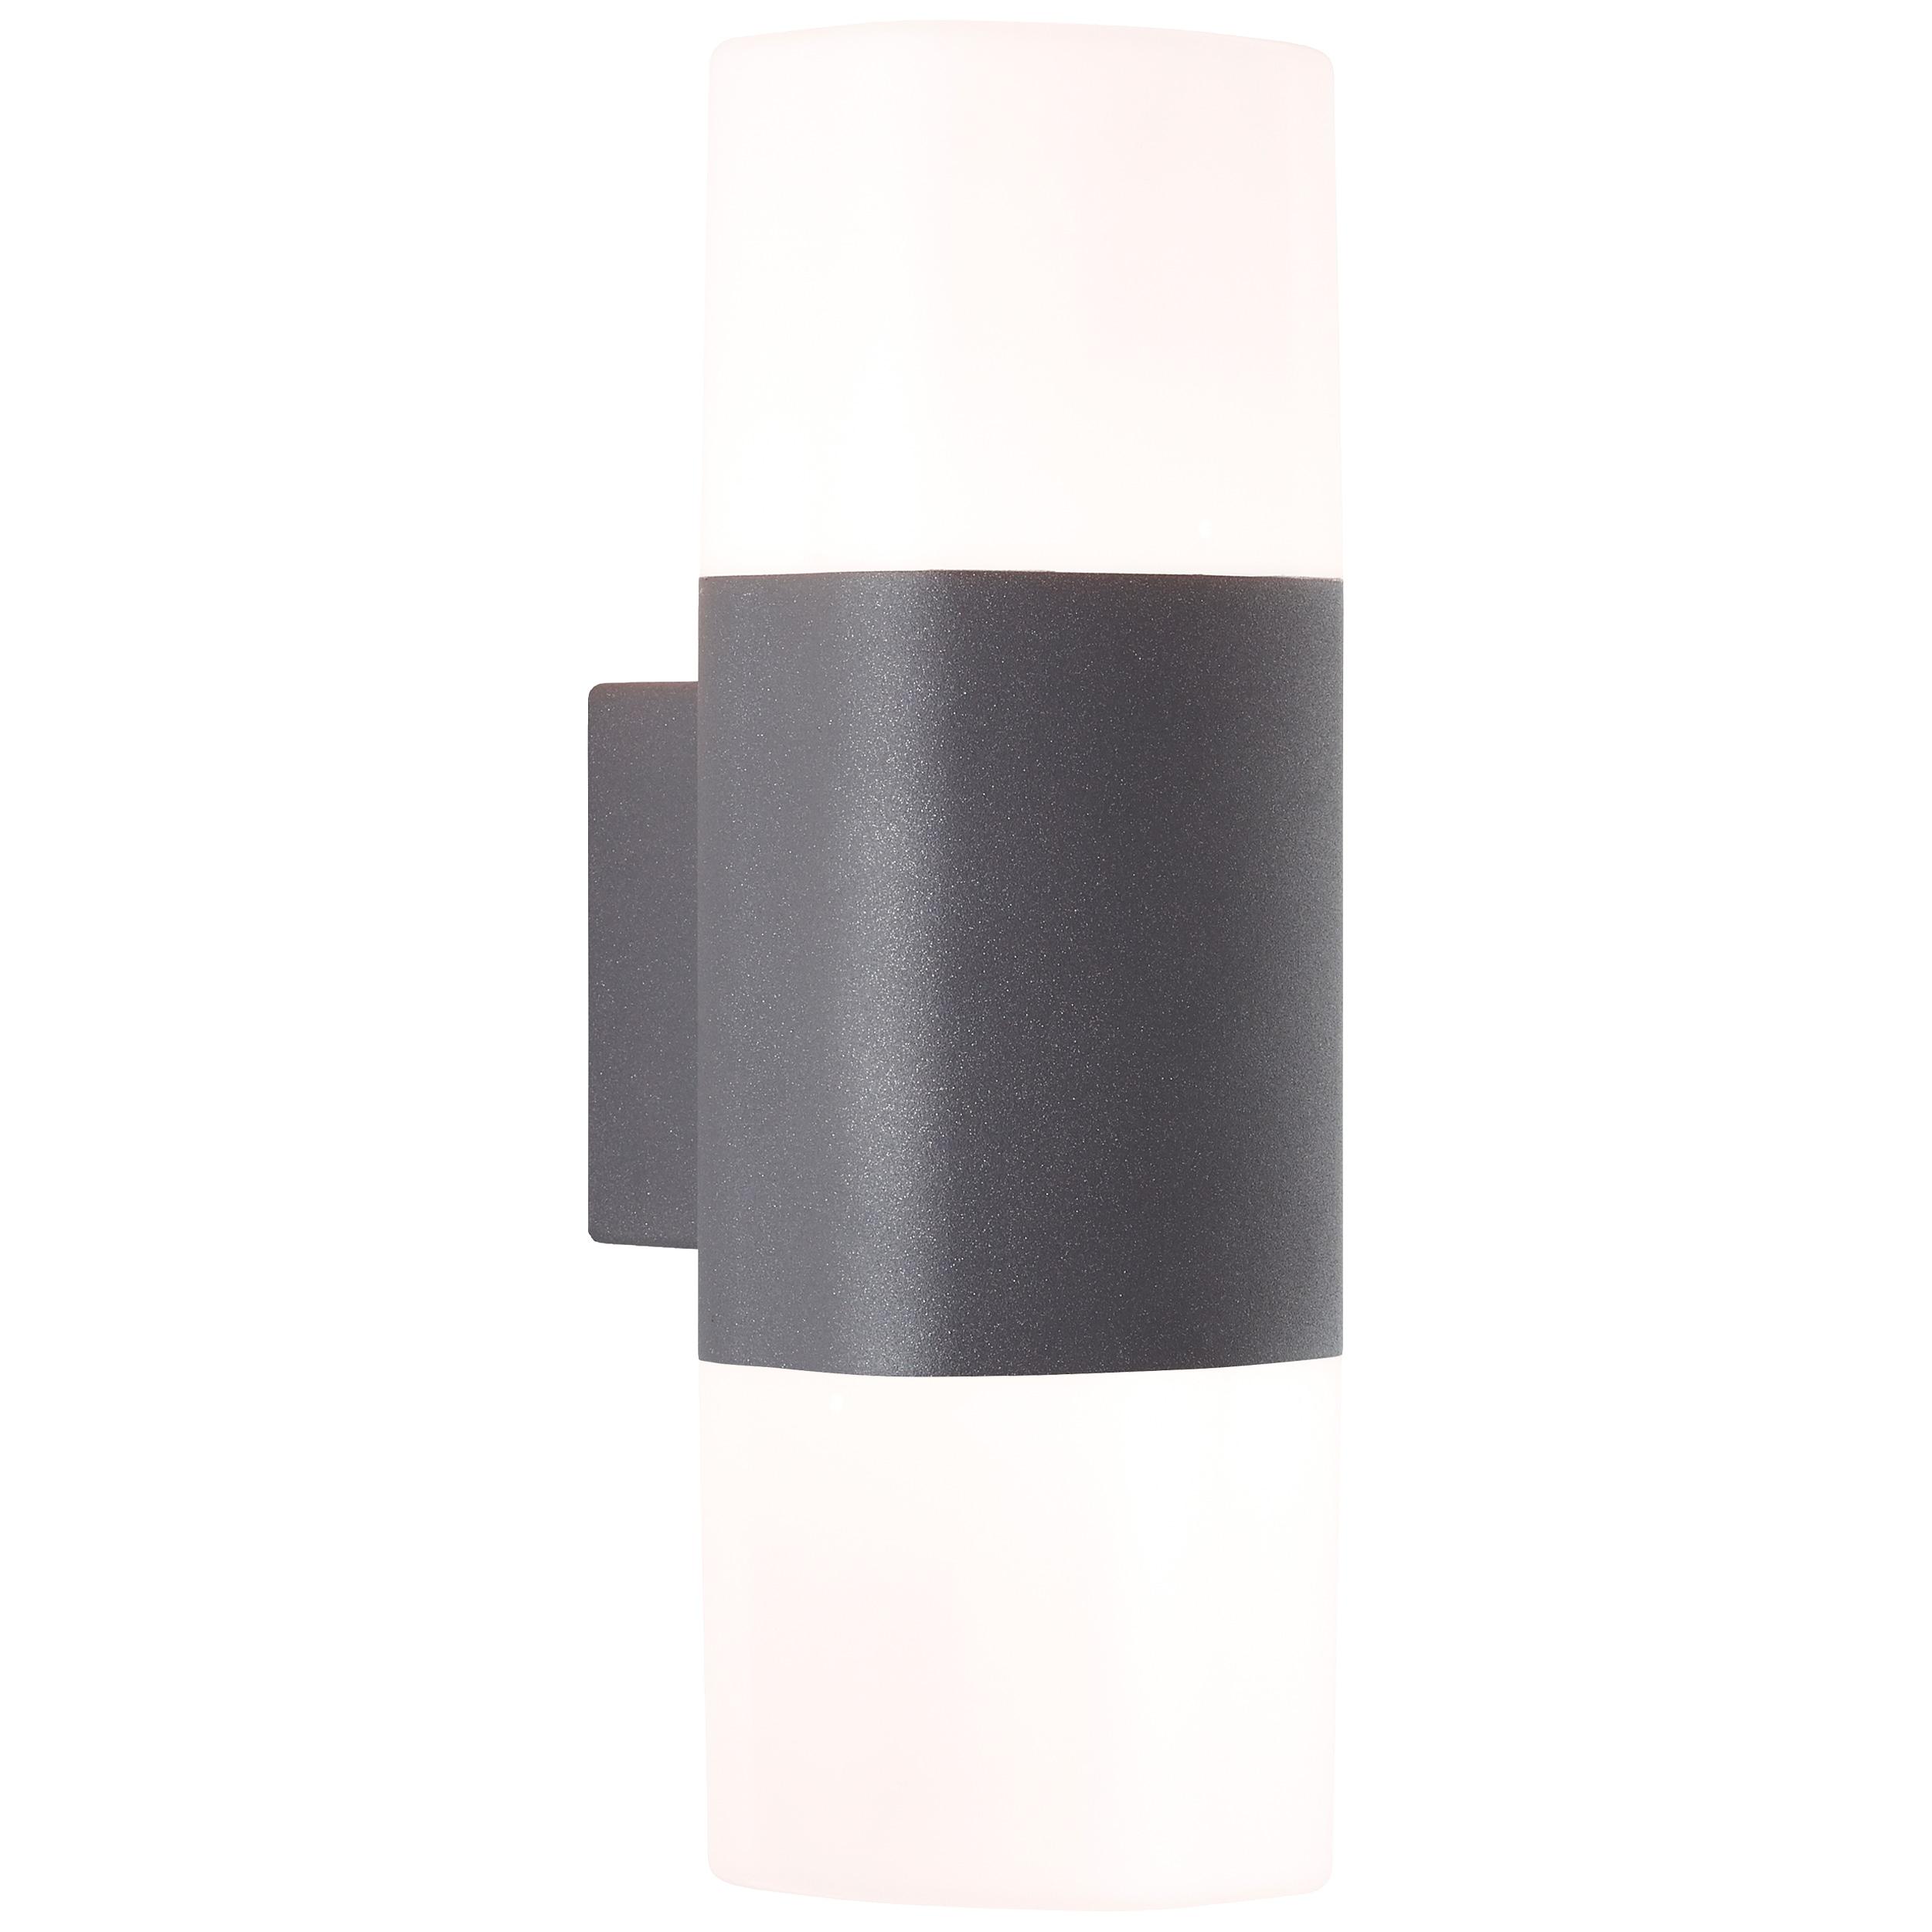 AEG Farlay LED Außenwandleuchte 2flg anthrazit